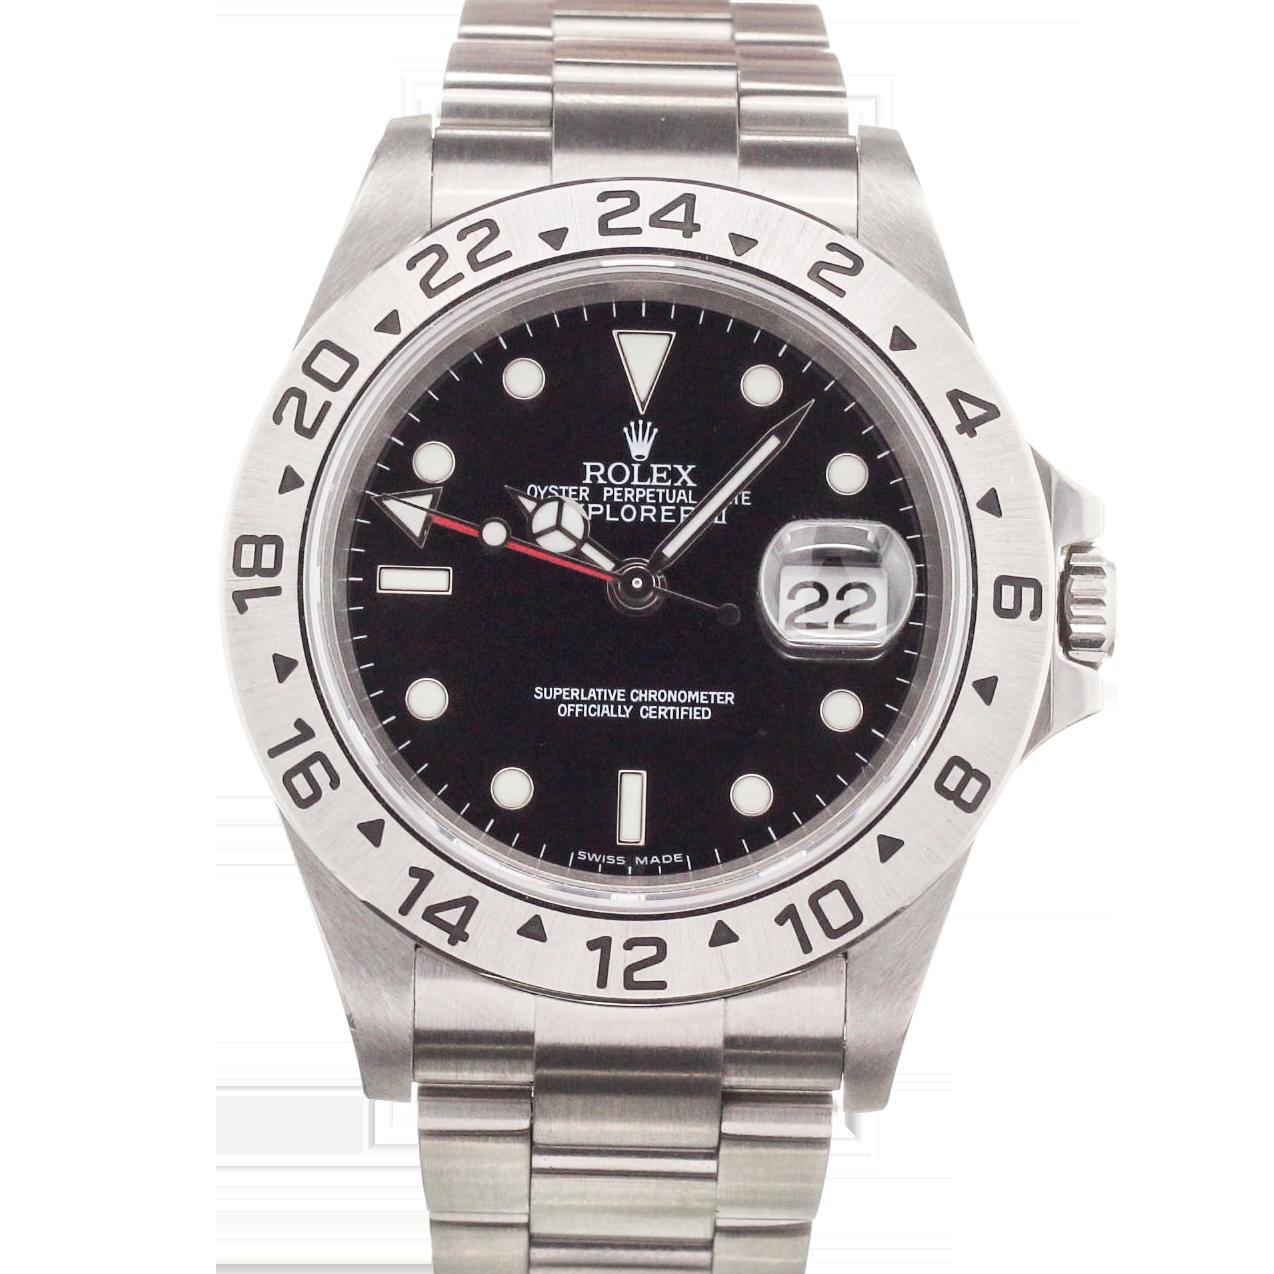 Rolex Explorer 2 alle Infos & Preise   CHRONEXT